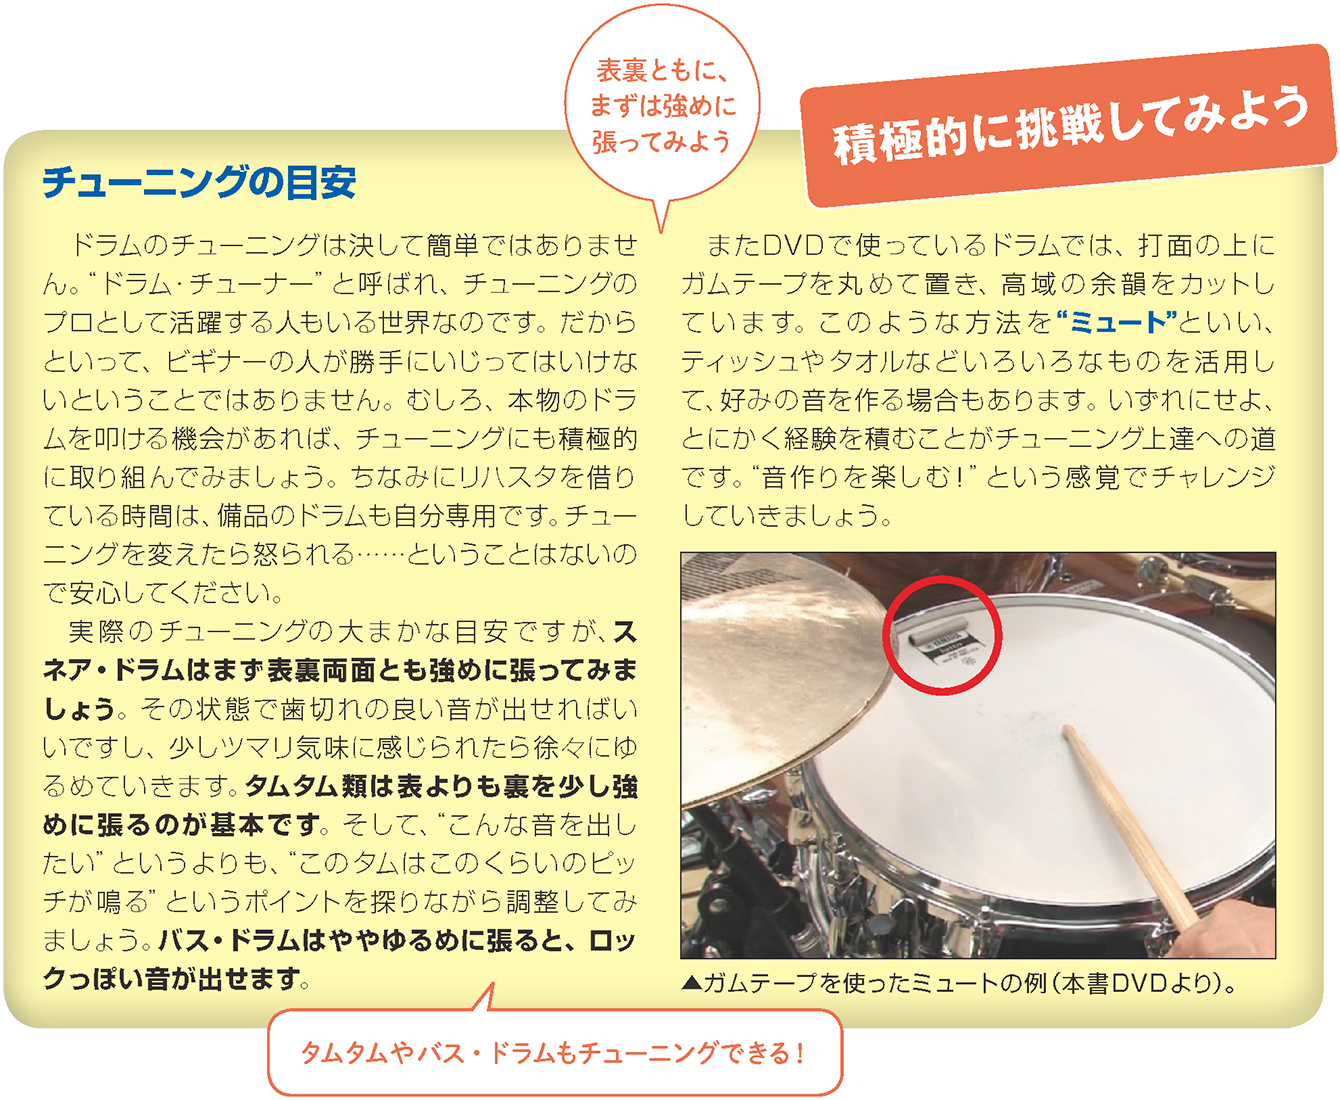 http://musicschool-navi.jp/columns/columns/assets_c/2017/keion02/keion_v2_drum_05.jpg